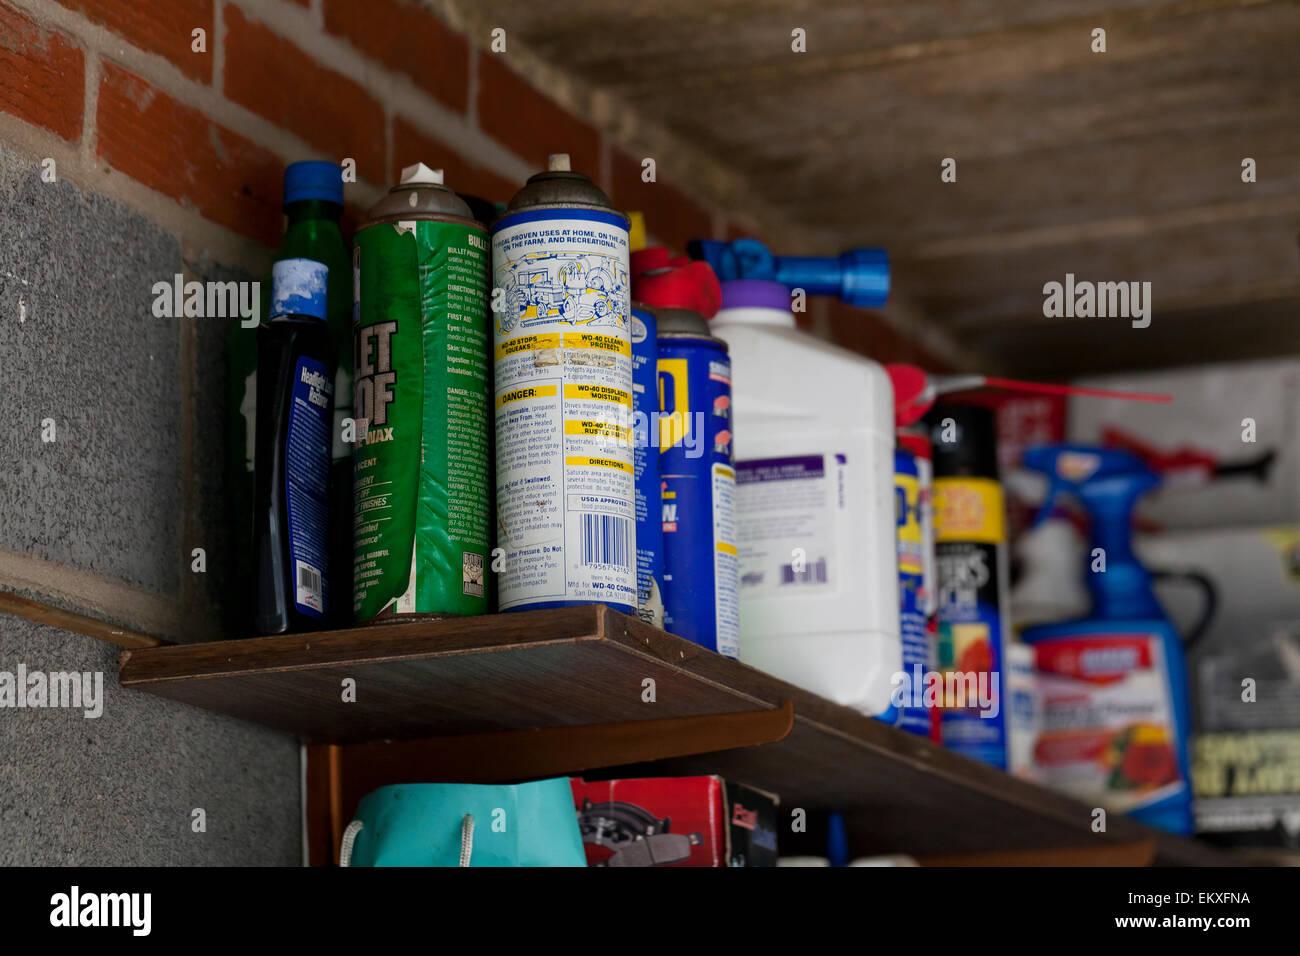 Chemicals stored on garage shelf - USA - Stock Image